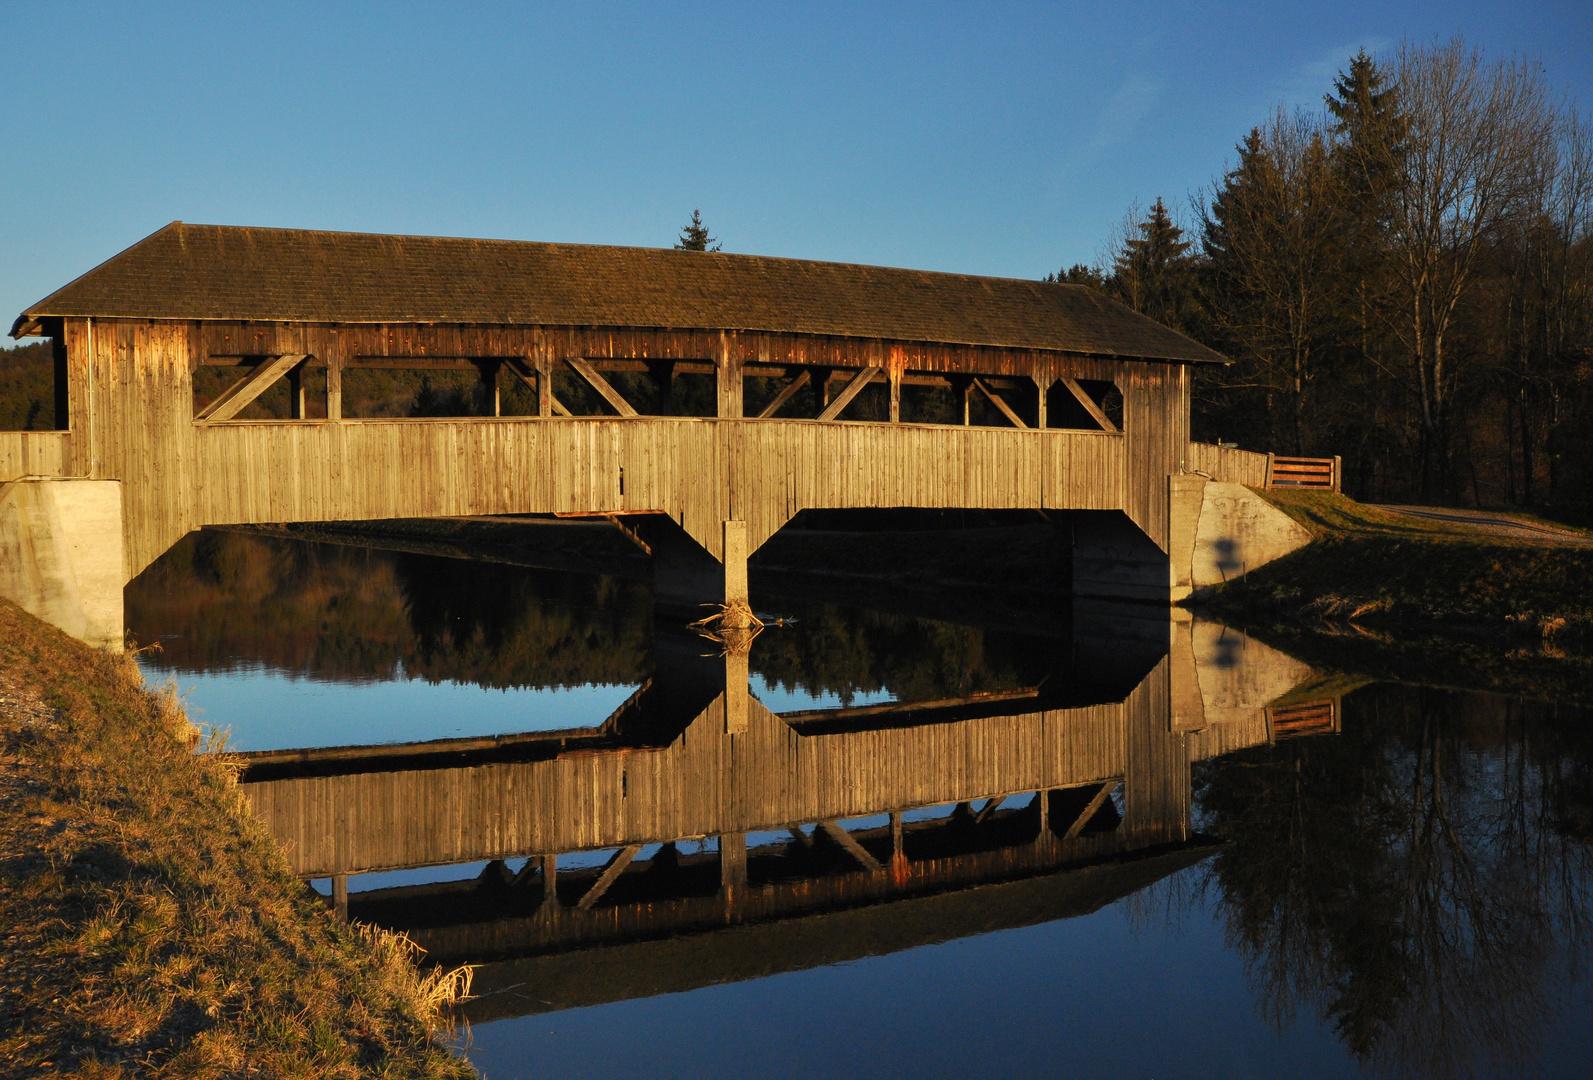 Holzbrücke über den Isarkanal bei Aumühle